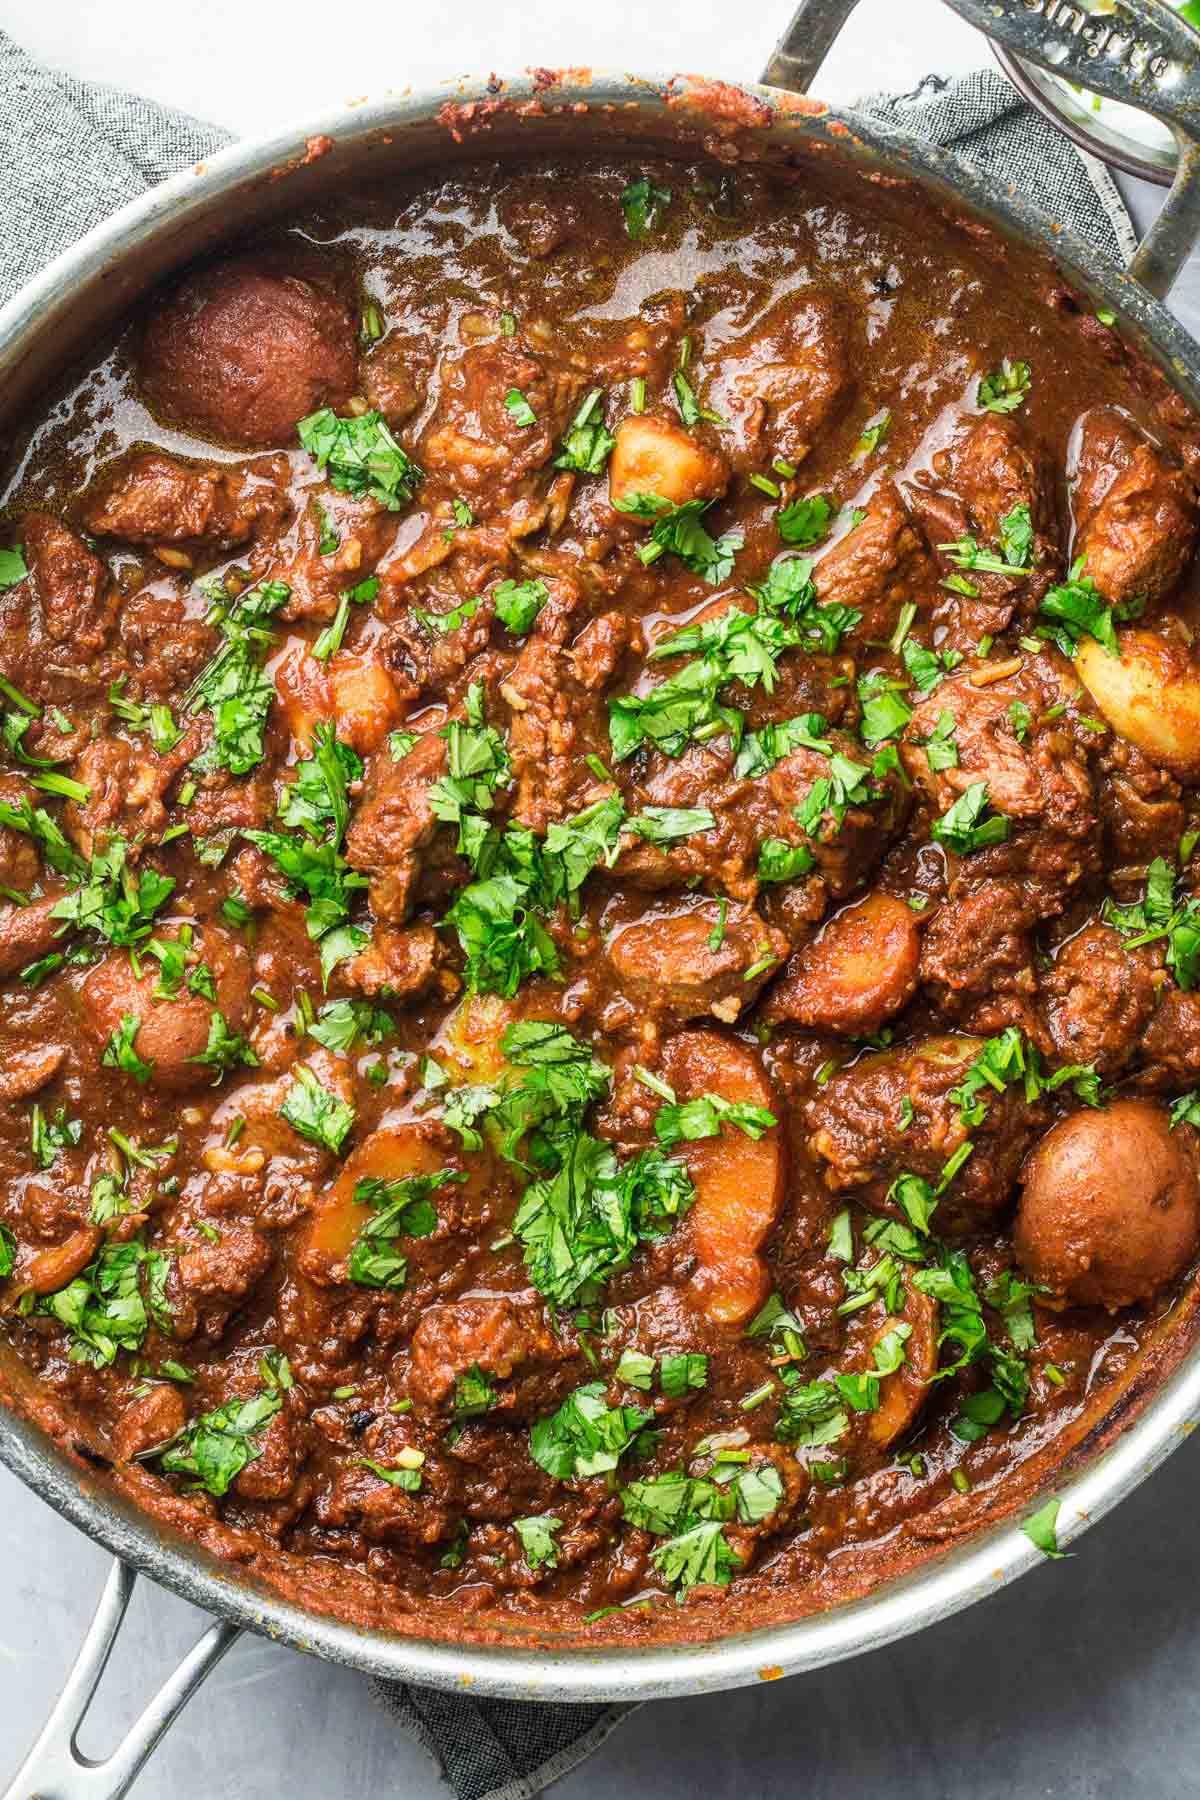 lamb curry in pan with cilantro garnish